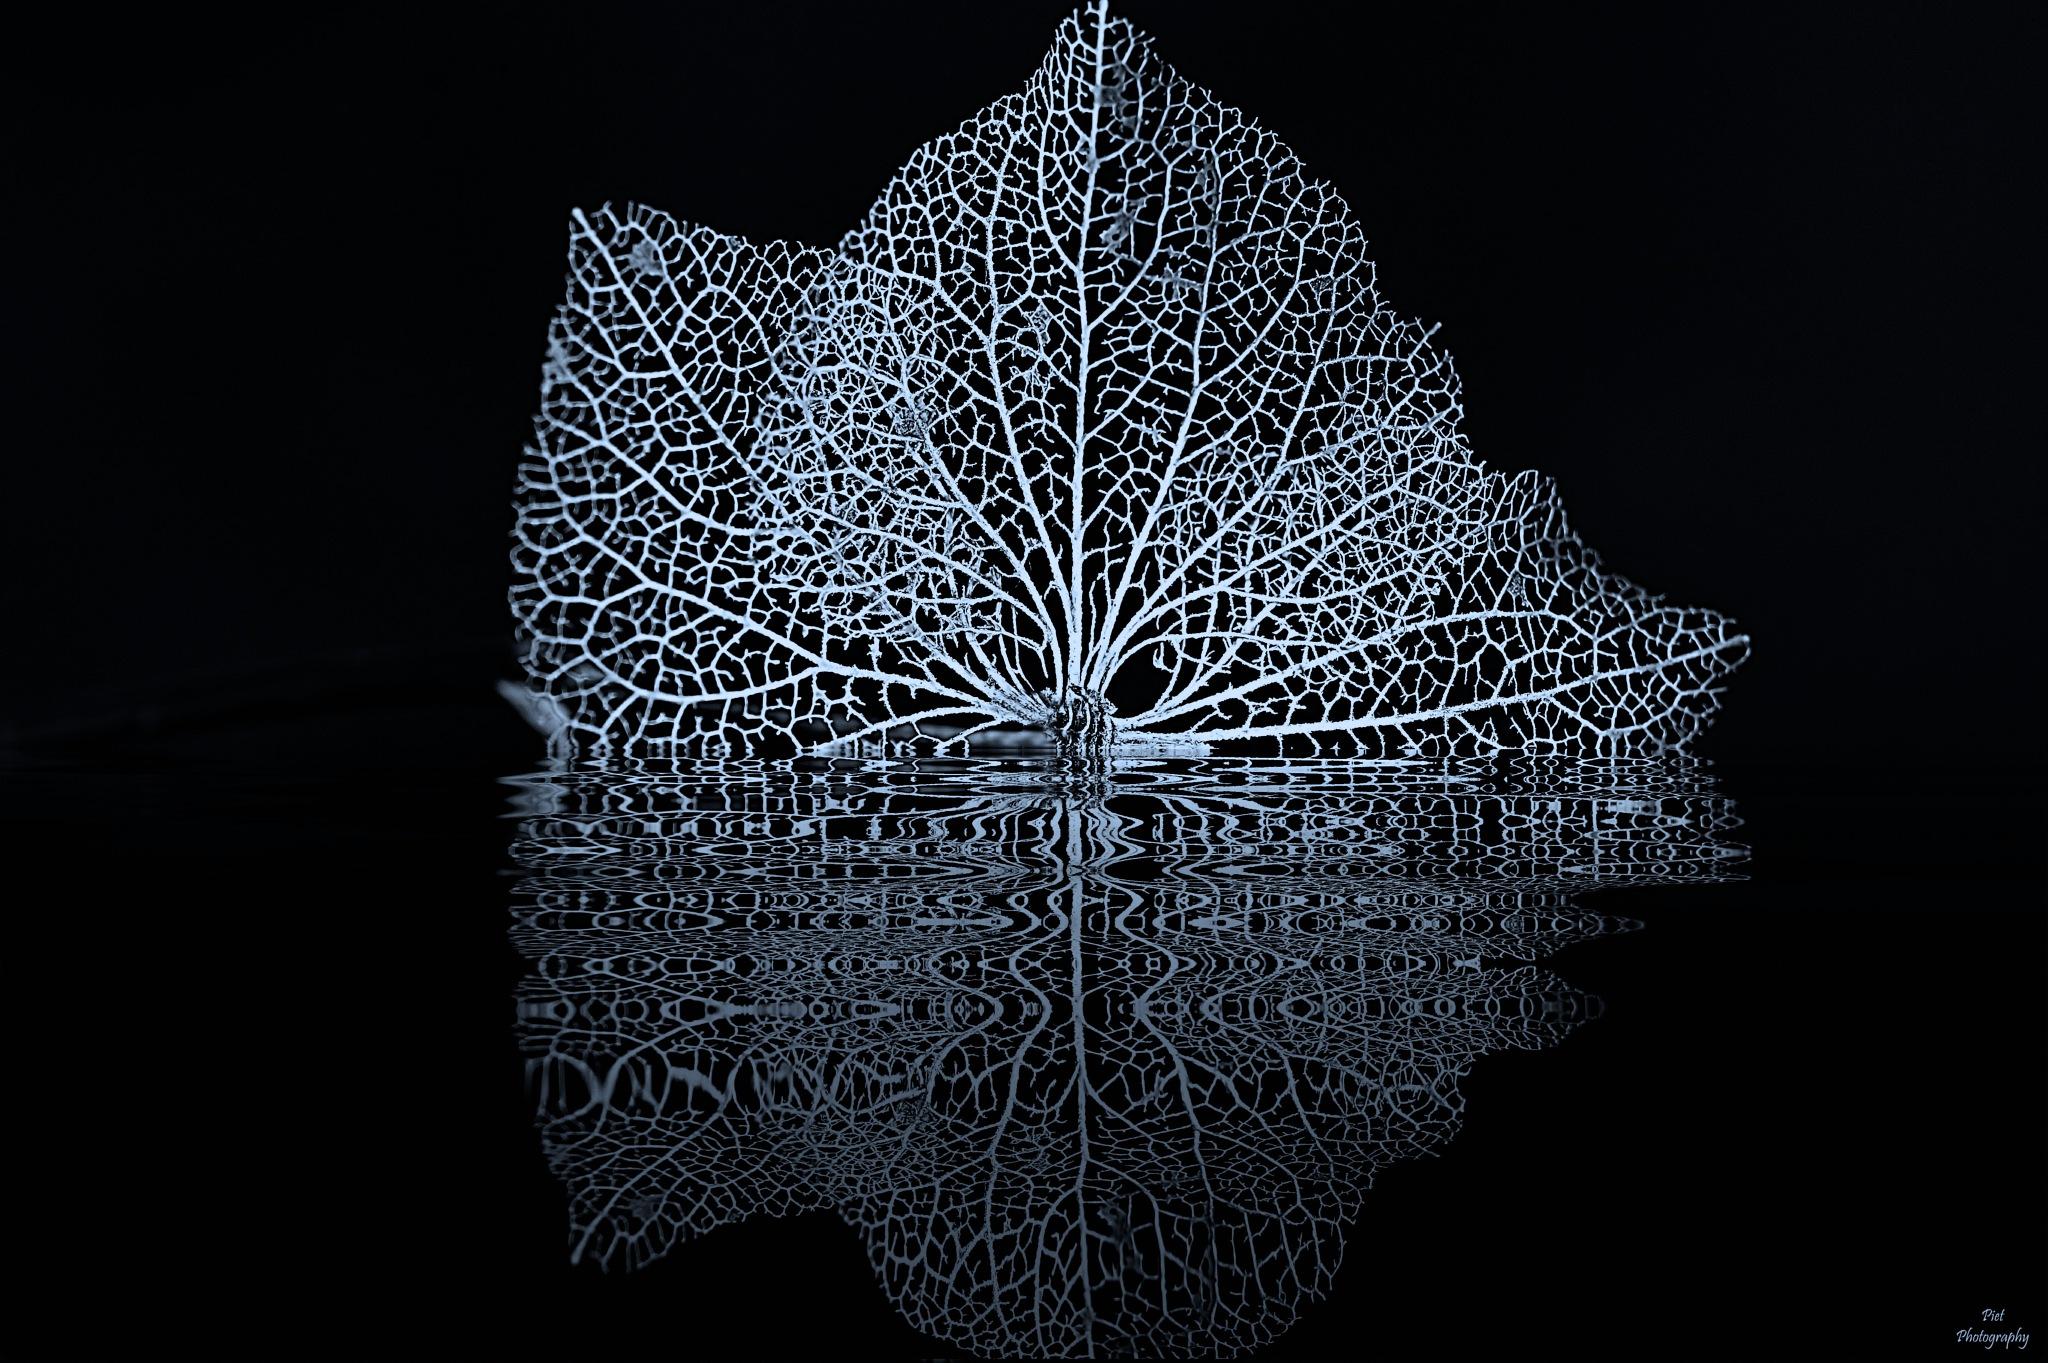 Reflection.... by PWaardenburg